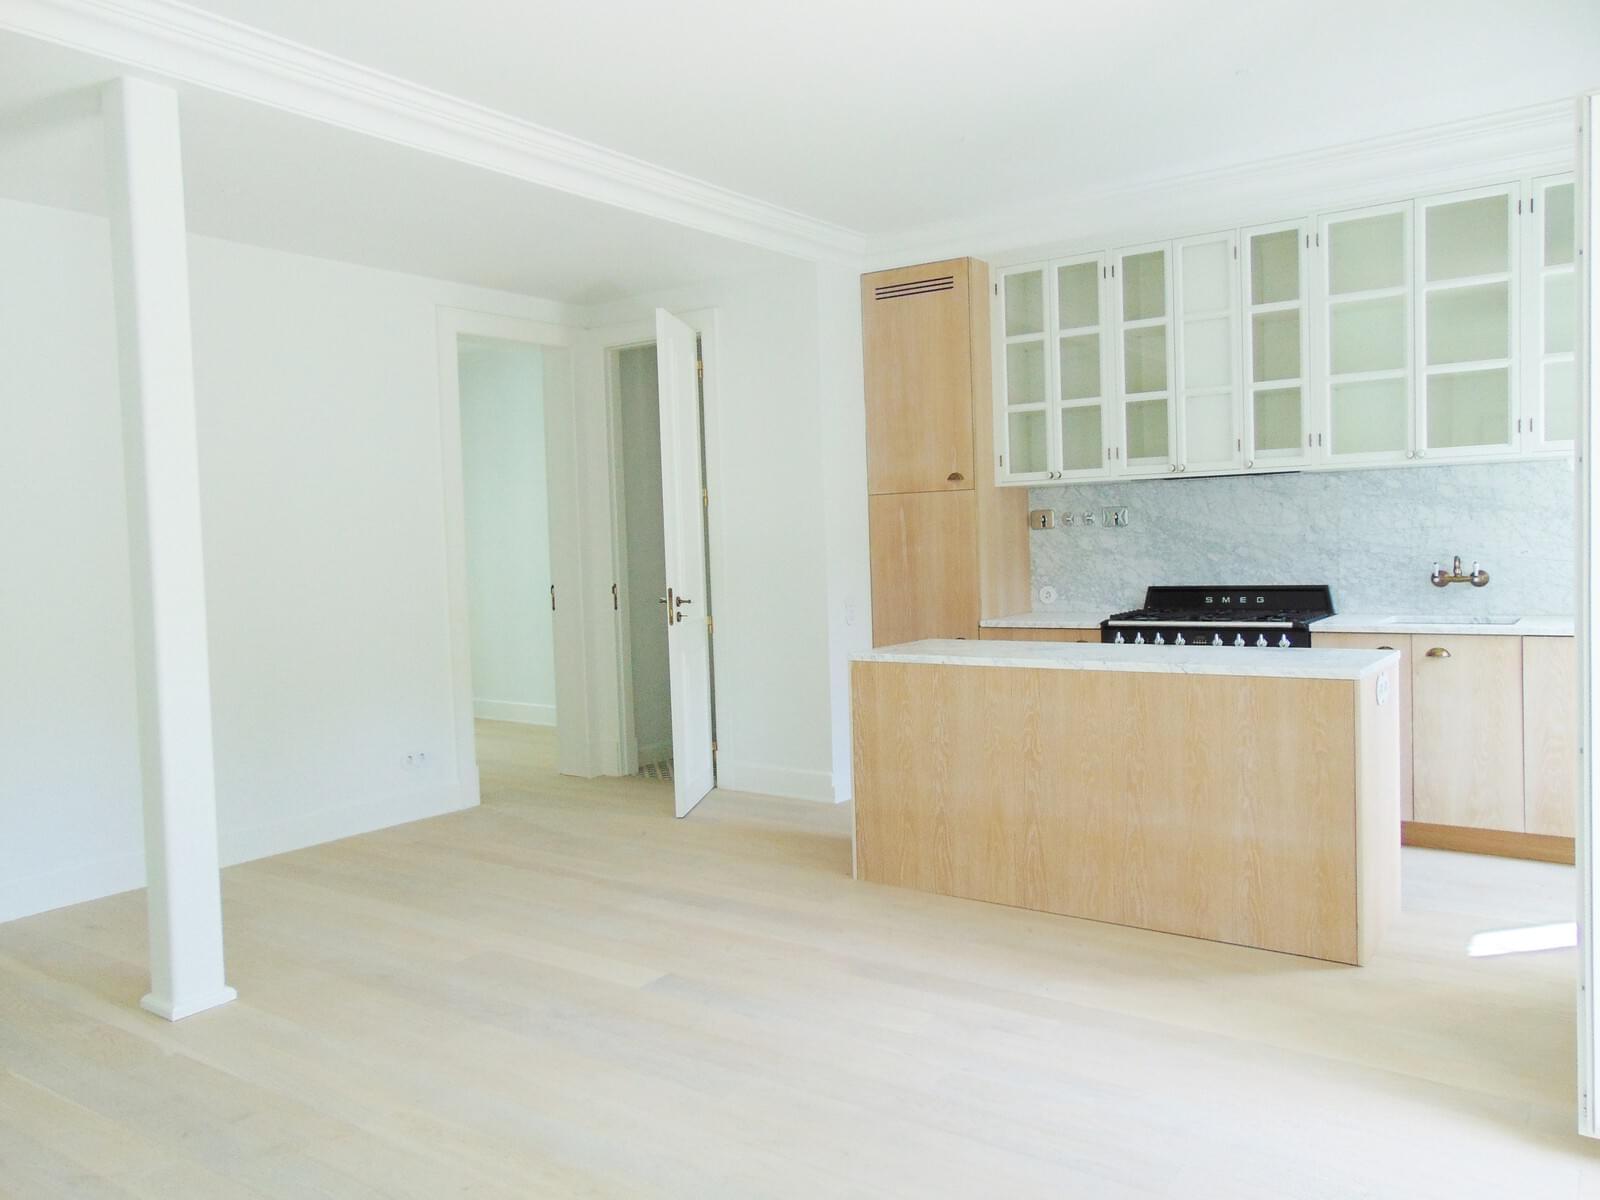 pf18152-apartamento-t2-lisboa-e63cbc68-9dcb-470e-8a92-8596ea3a7d5c